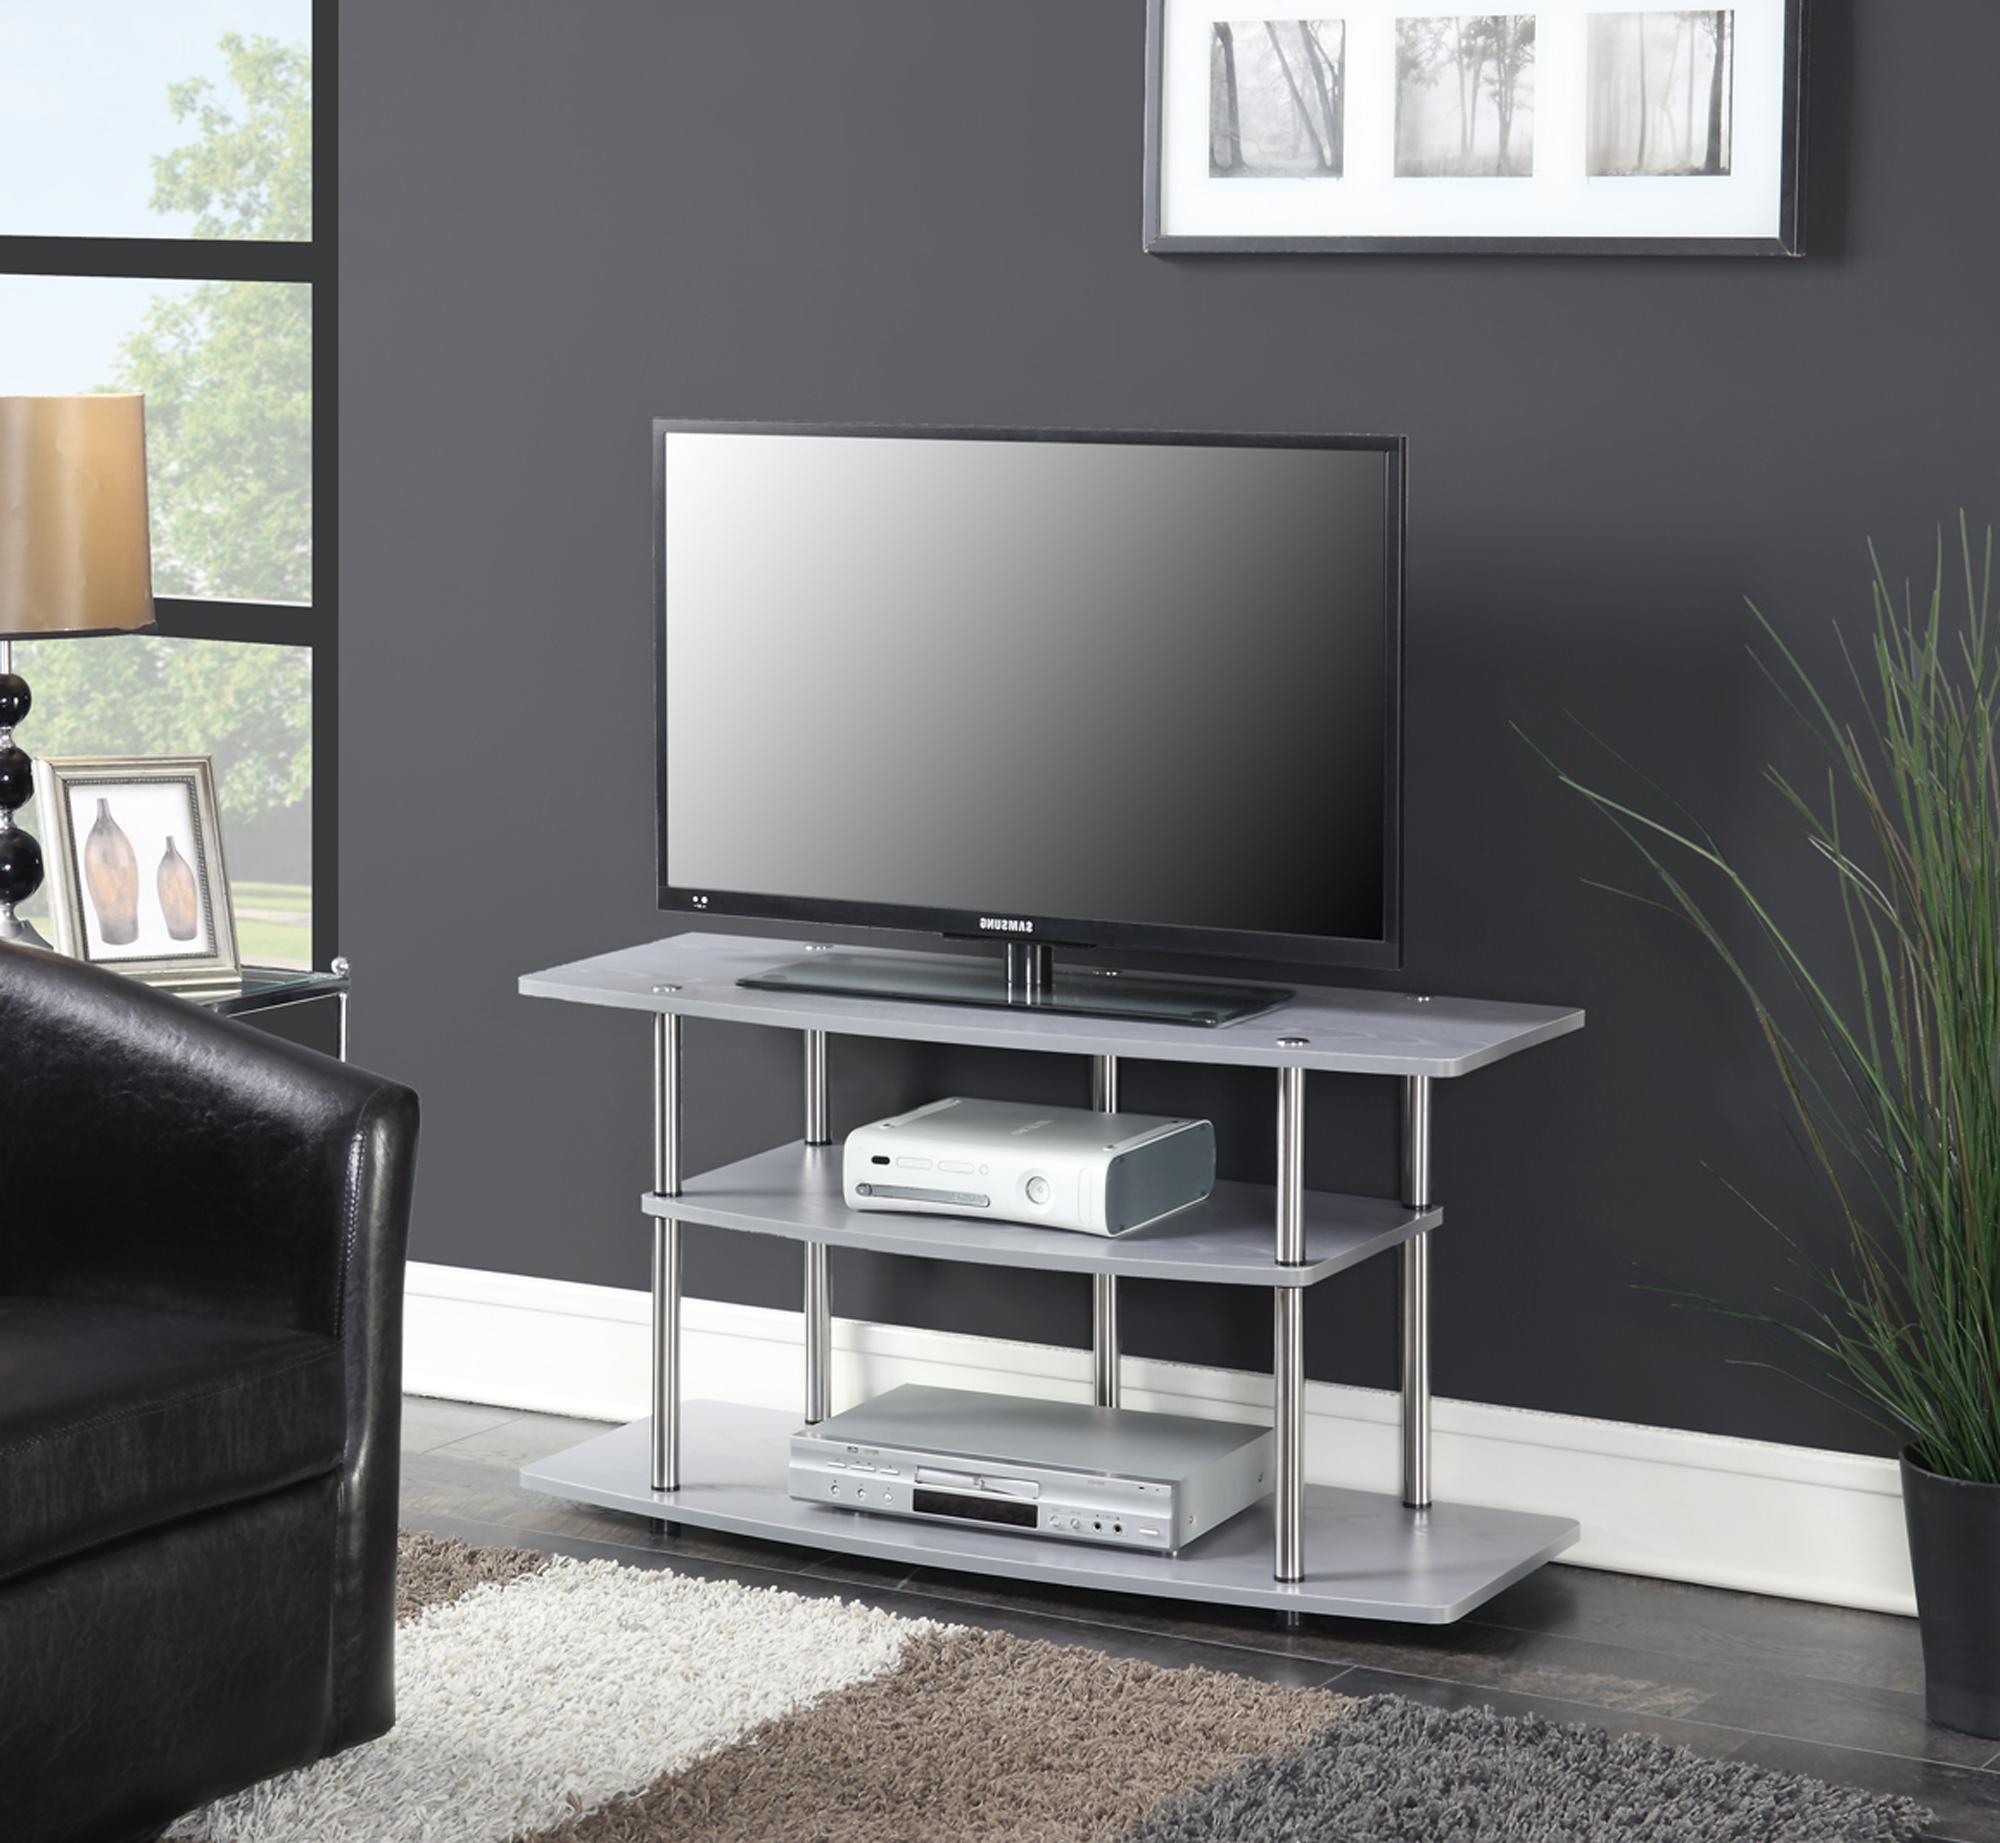 Recent Copen Wide Tv Stands Regarding Convenience Concepts Designs2go No Tools 3 Tier Wide Tv (View 9 of 10)